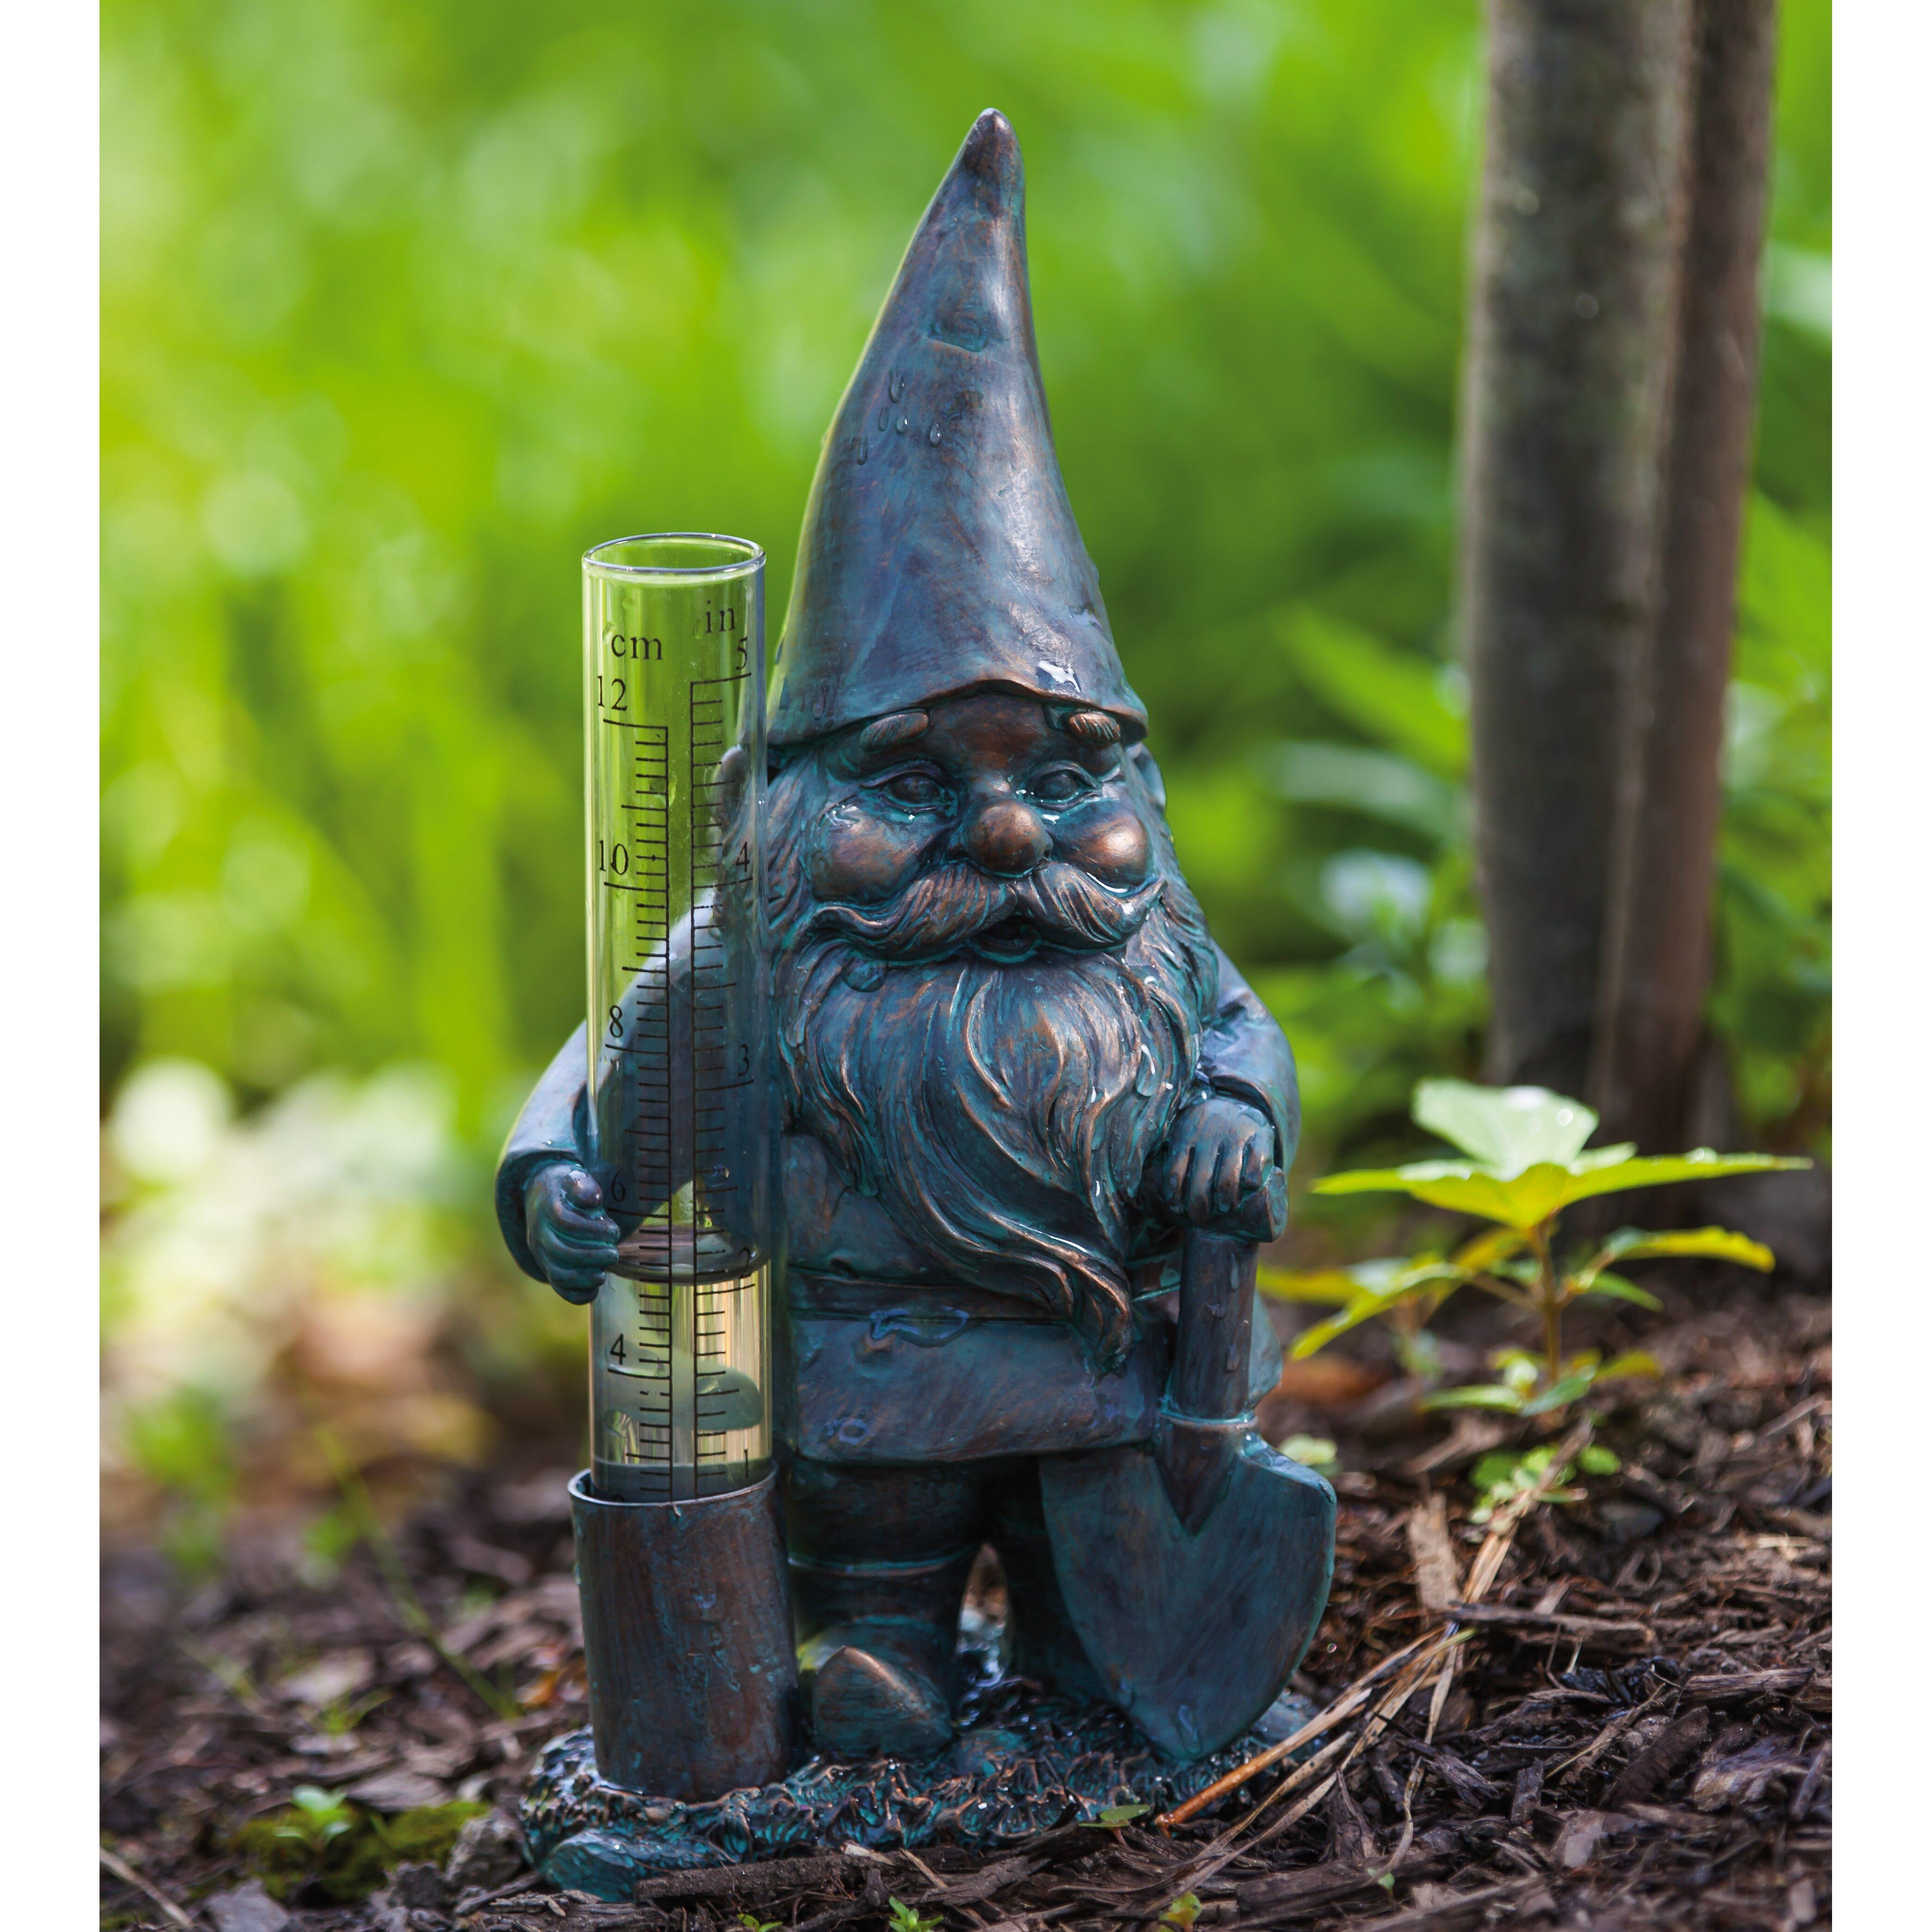 Evergreen Enterprises Inc 2 Piece Fariy and Gnome Rain Gauge Set